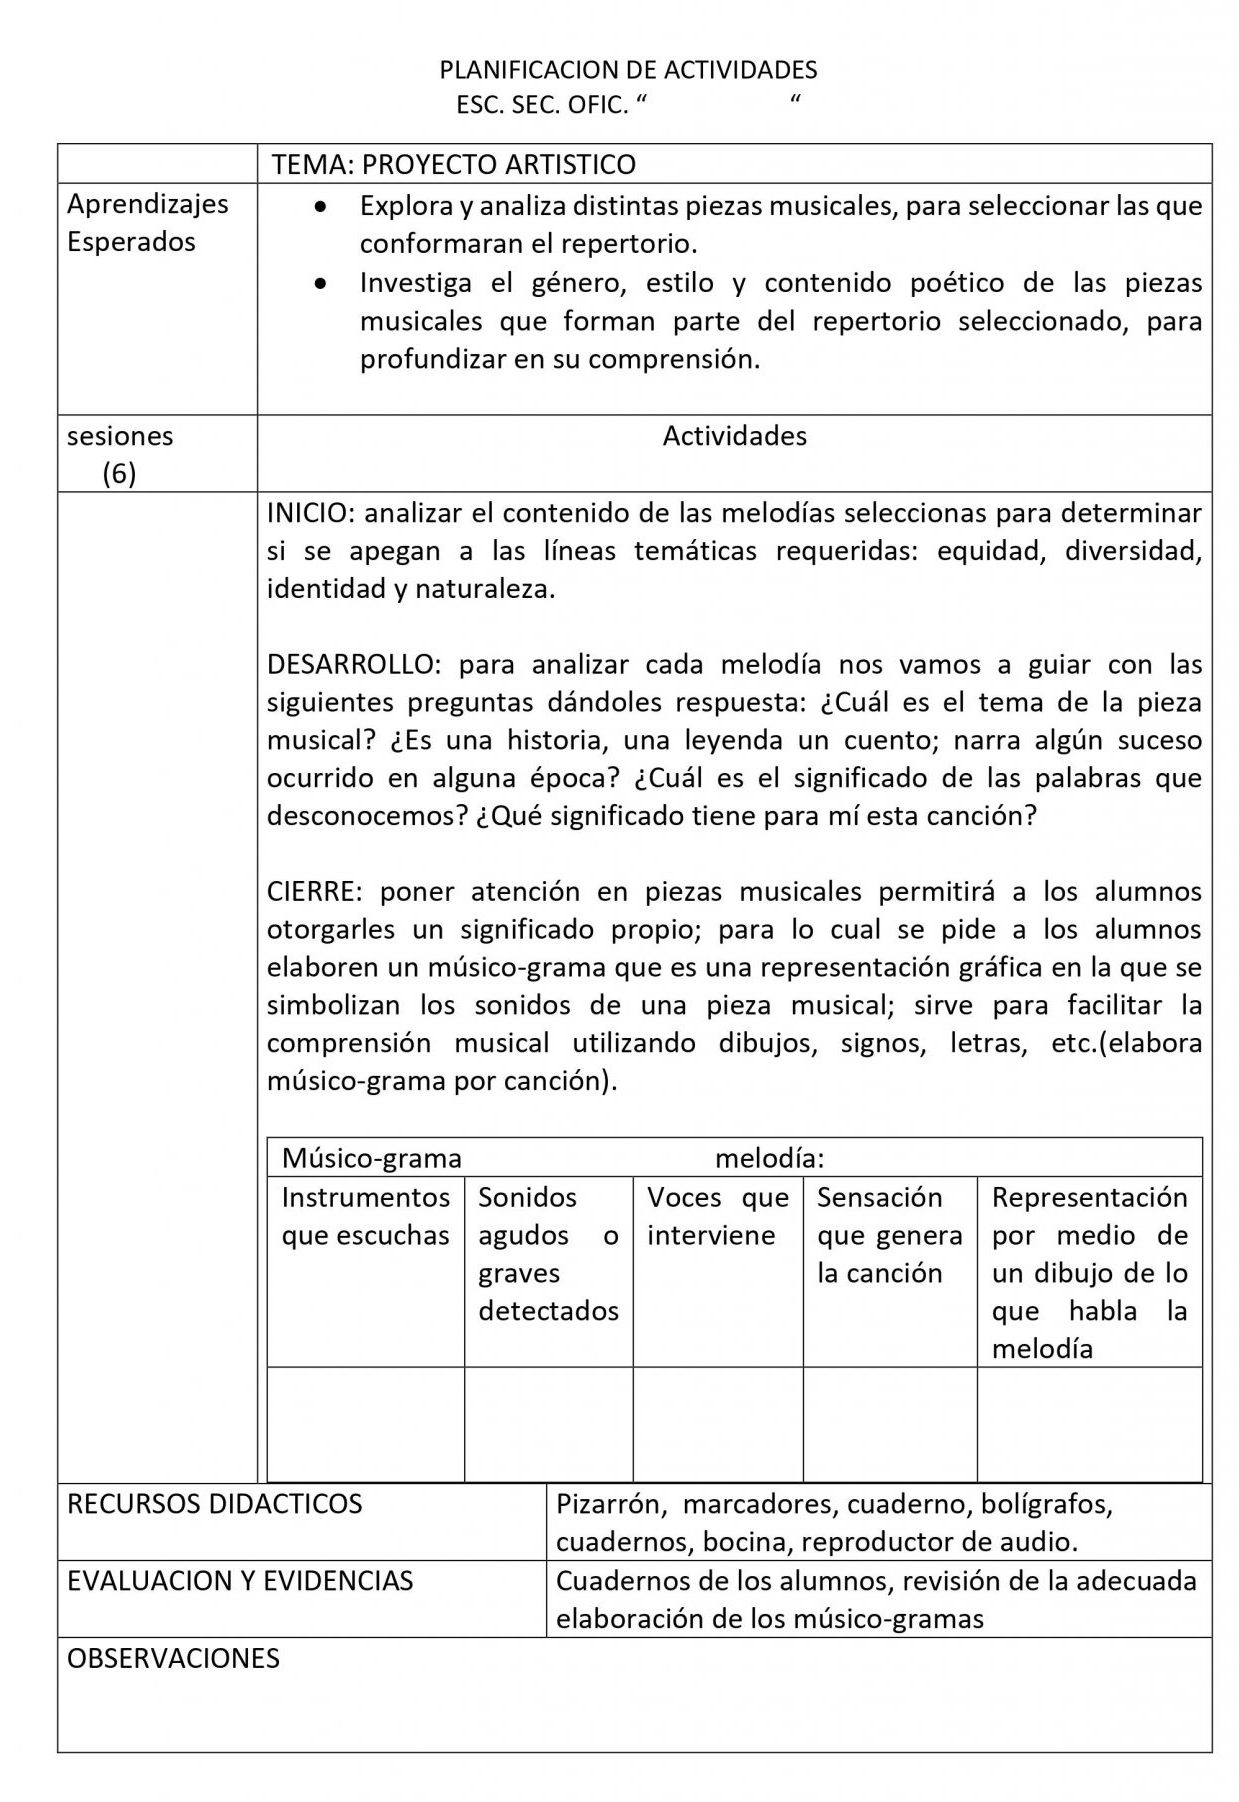 Planeaciones Artes Musica 1 Secundaria (Nuevo Modelo Educativo) 1er. Trimestre 04